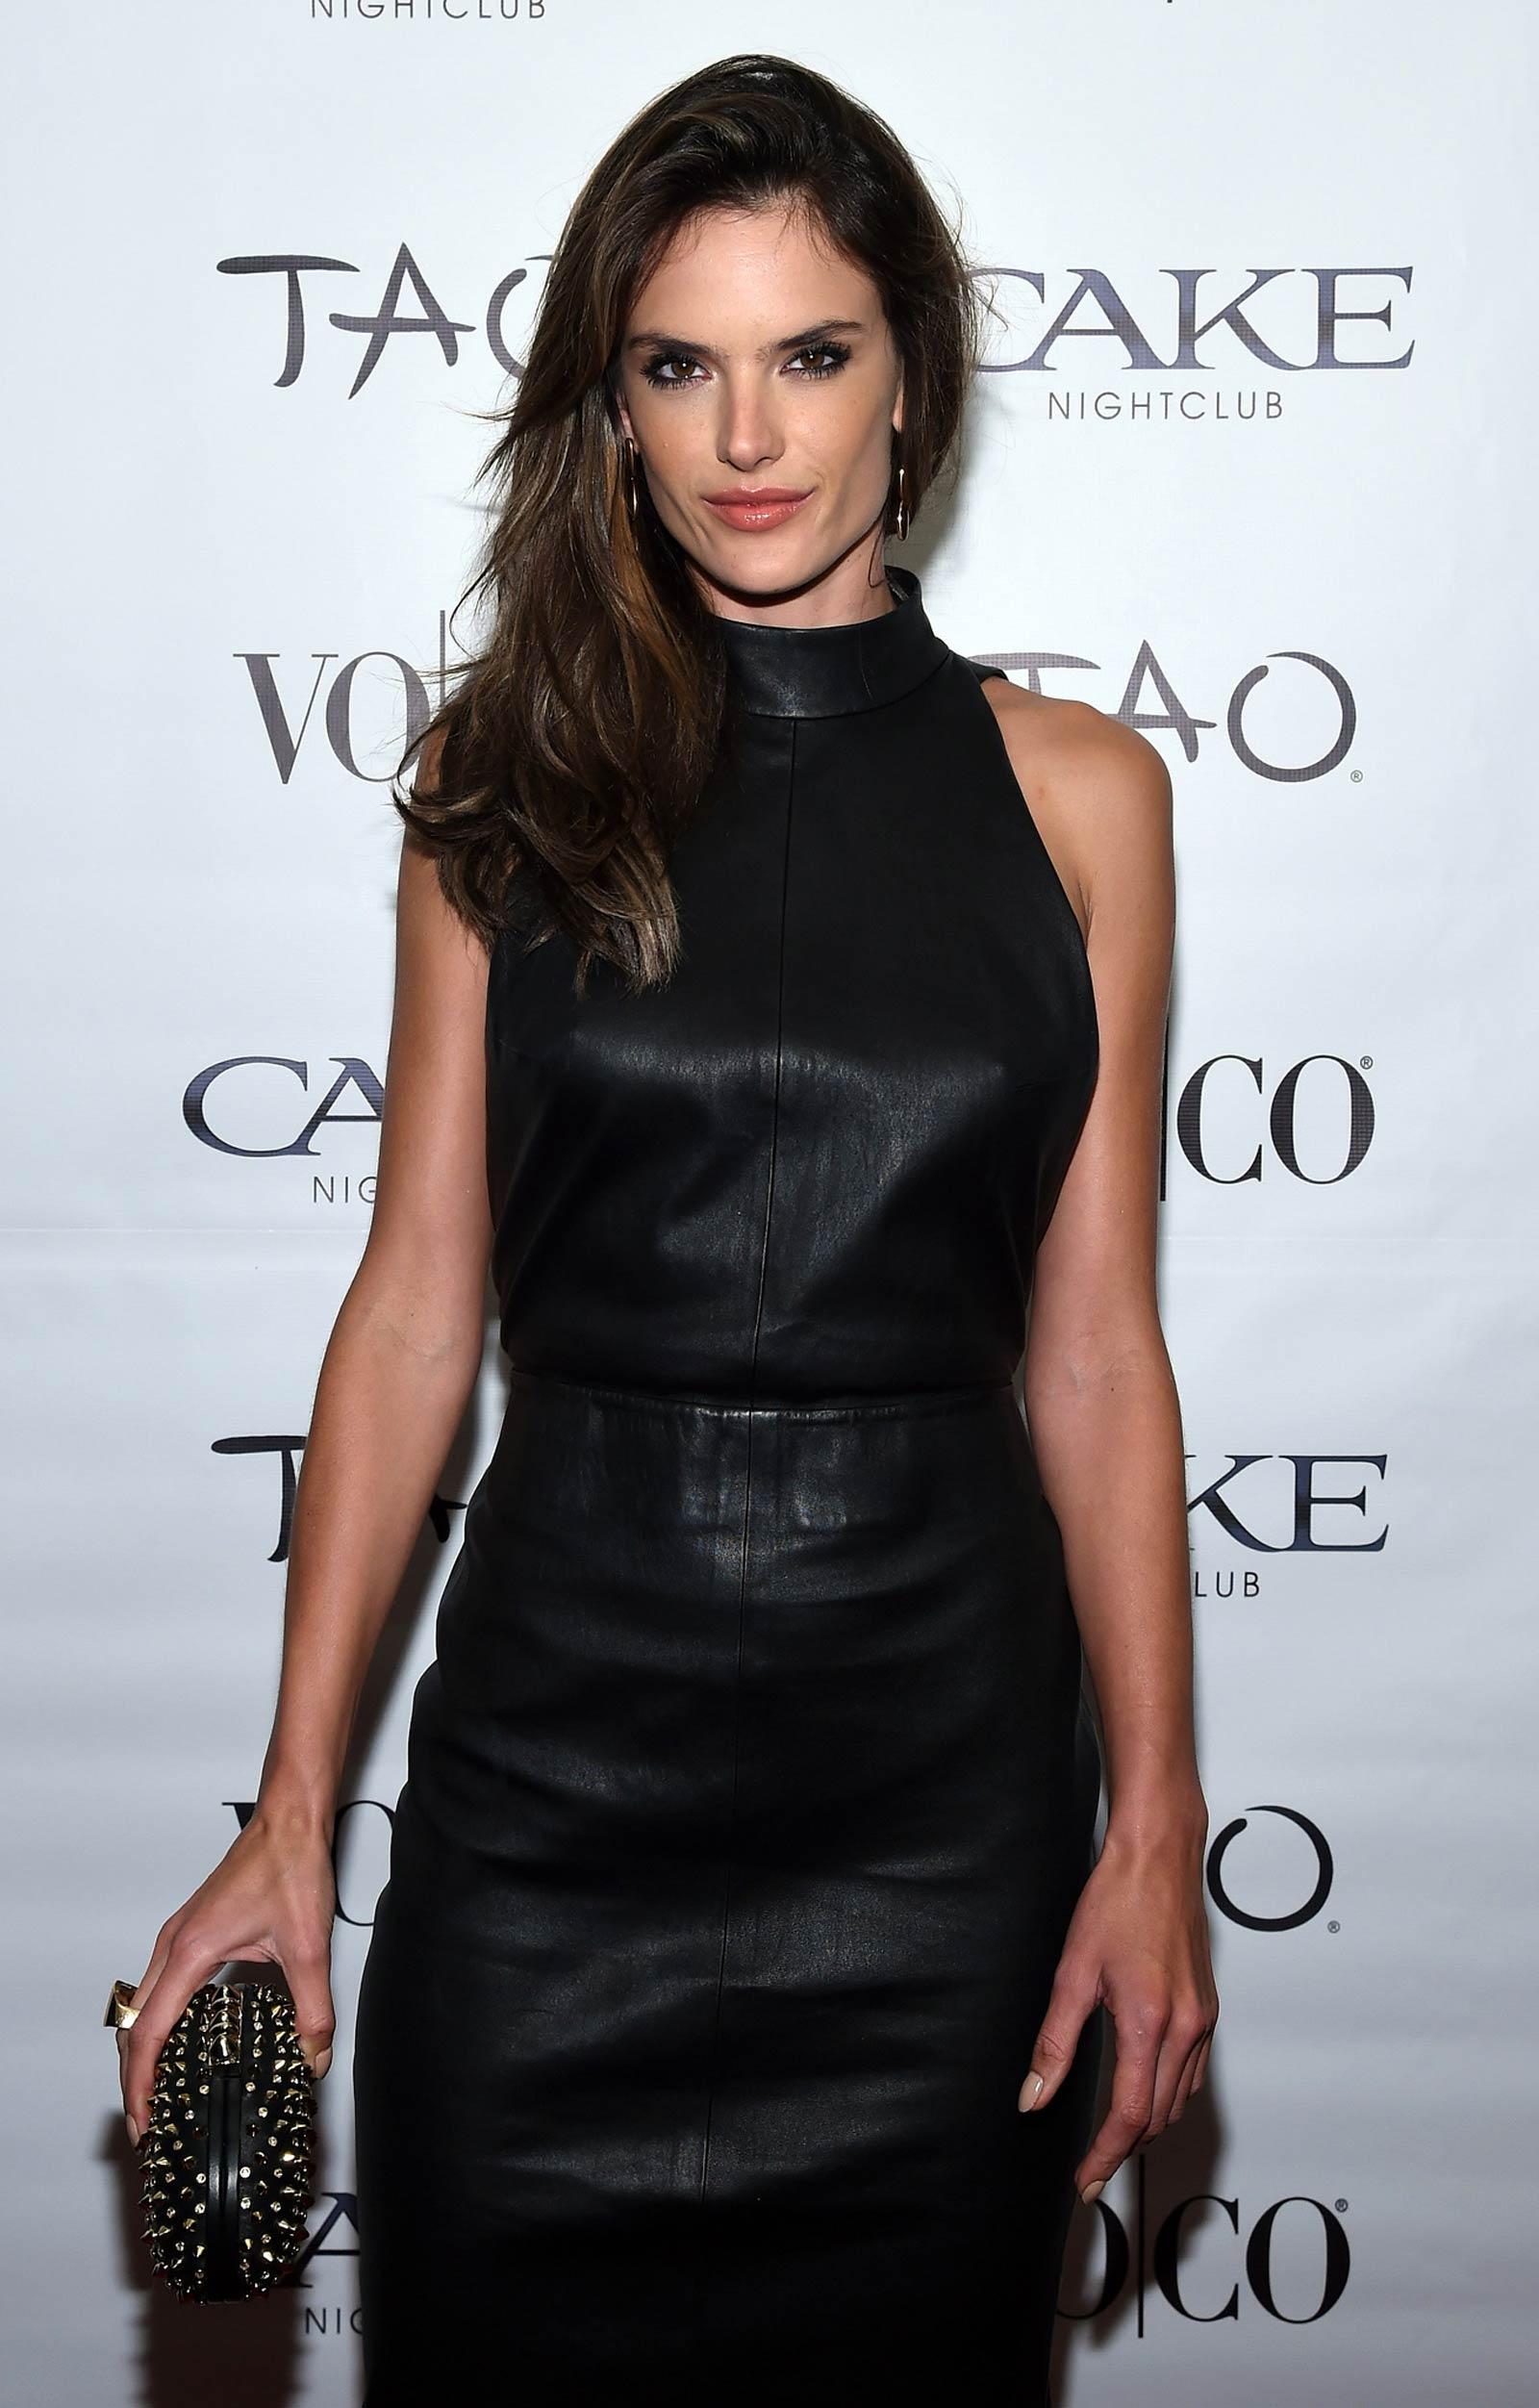 Alessandra Ambrosio hosts the VO|CO Vodka Coconut Water party